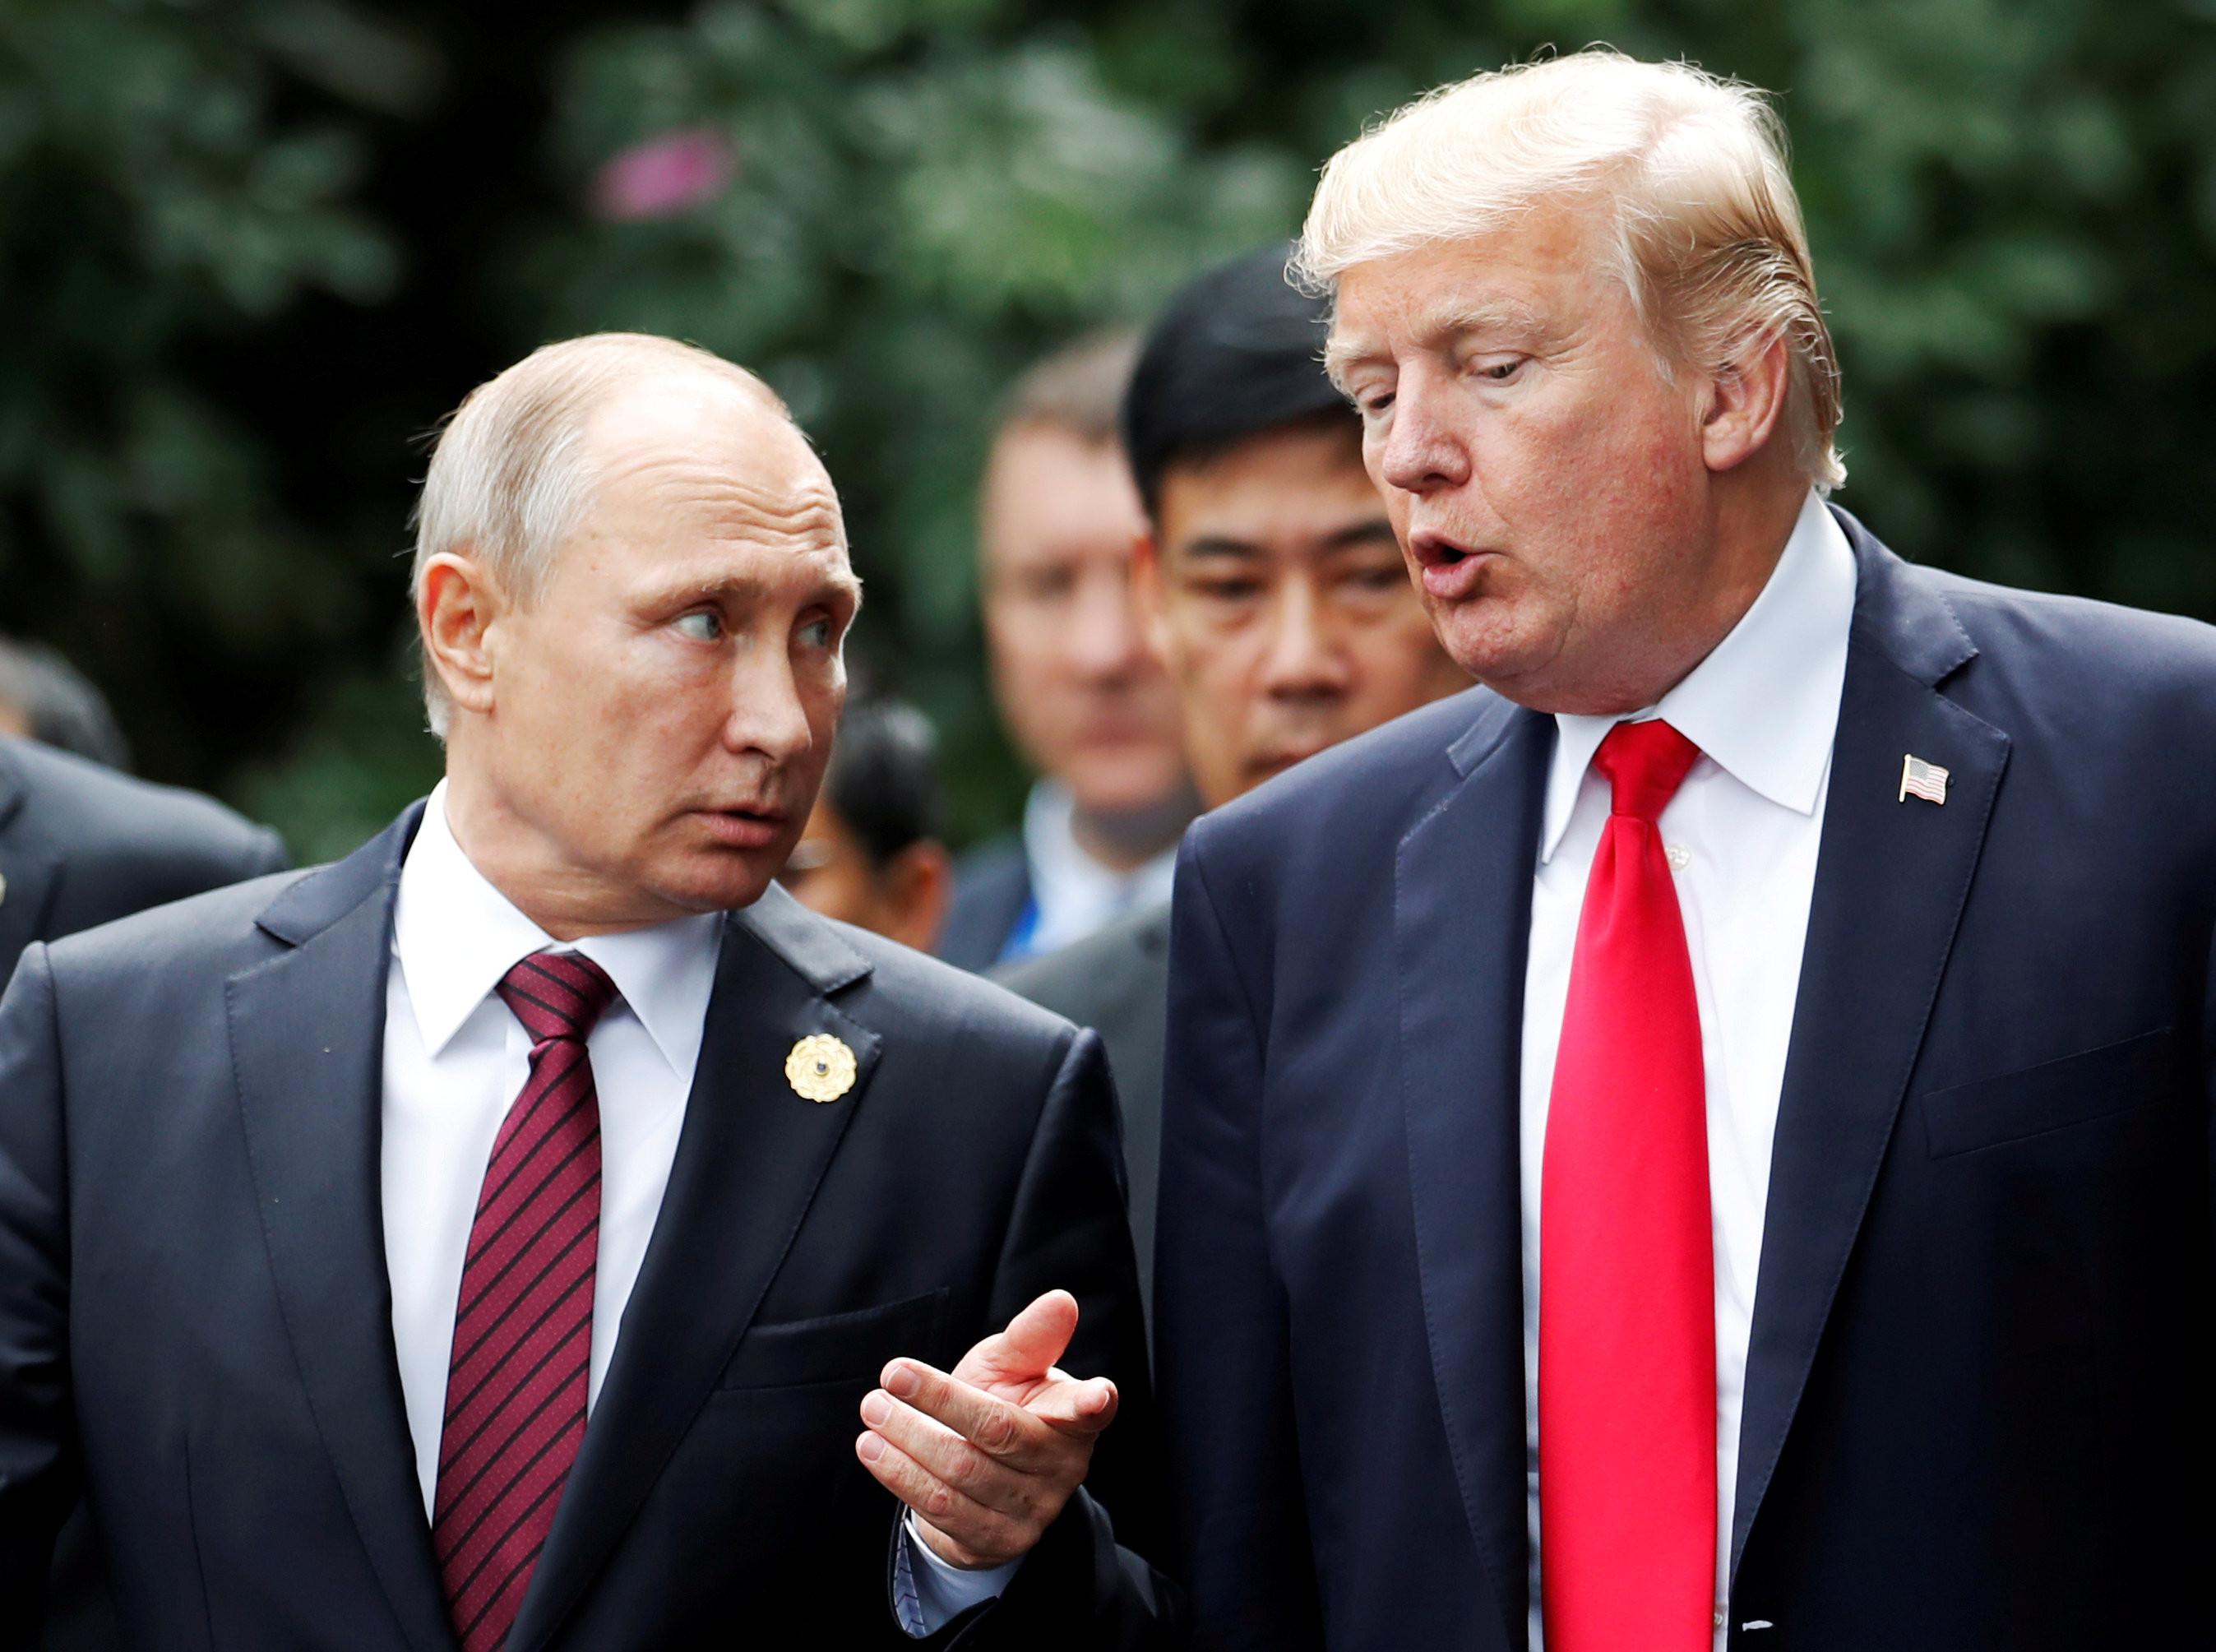 <p><span>Президент России Владимир Путин и президент США Дональд Трамп. Фото: &copy;REUTERS</span>/Jorge Silva</p>